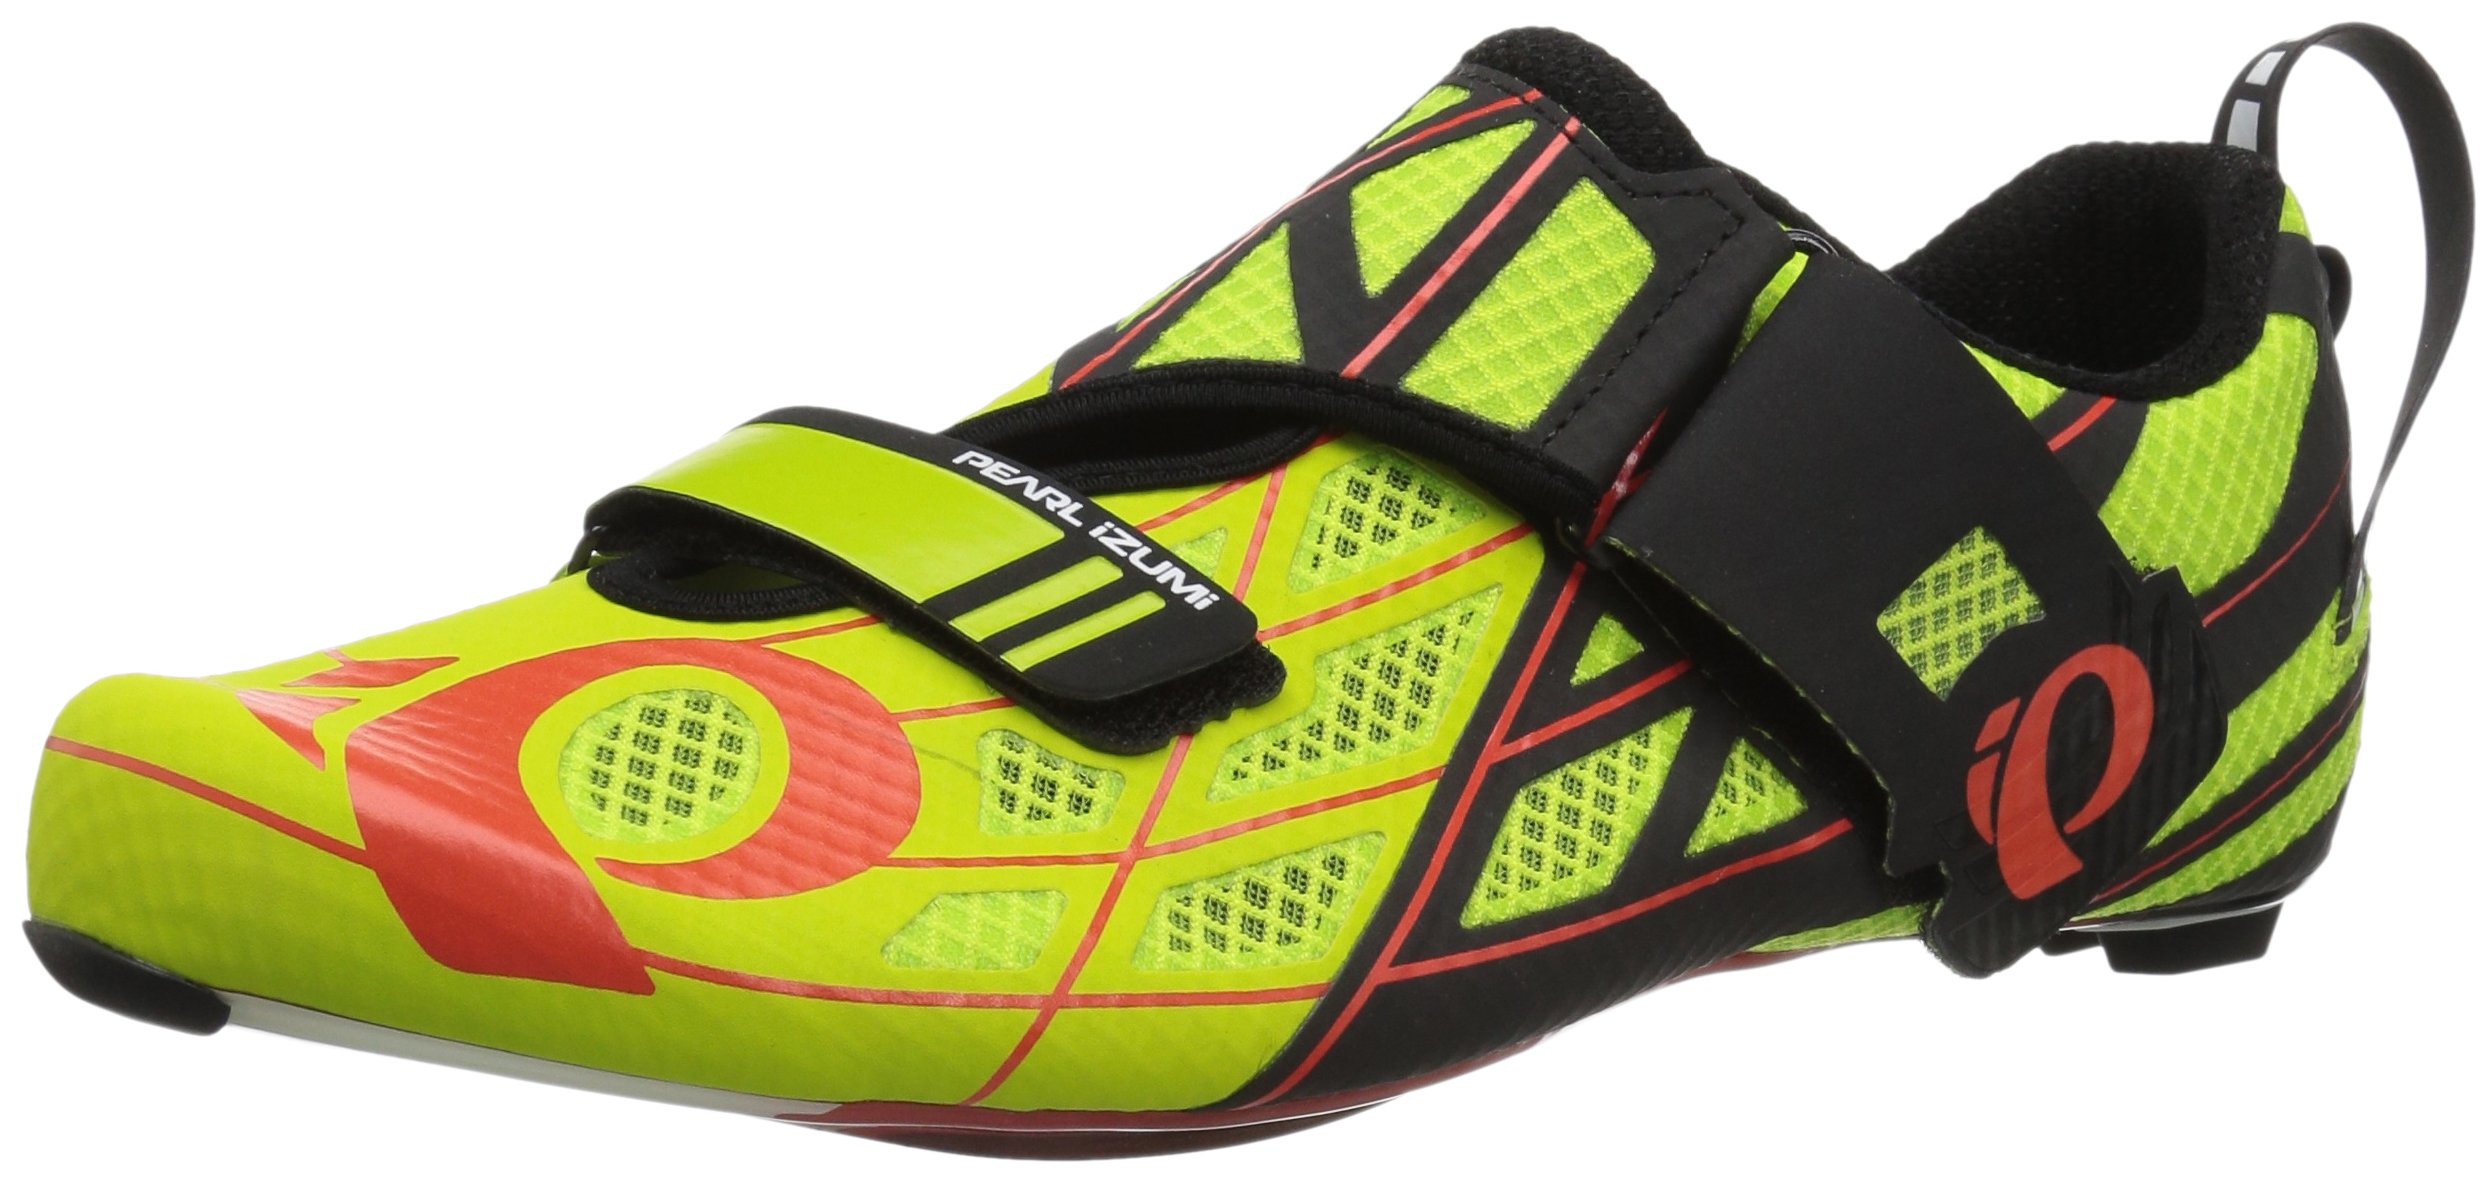 Pearl Izumi Tri Fly Pro v3 Cycling-Footwear, Lime Punch/Black, 48 EU/13 D US